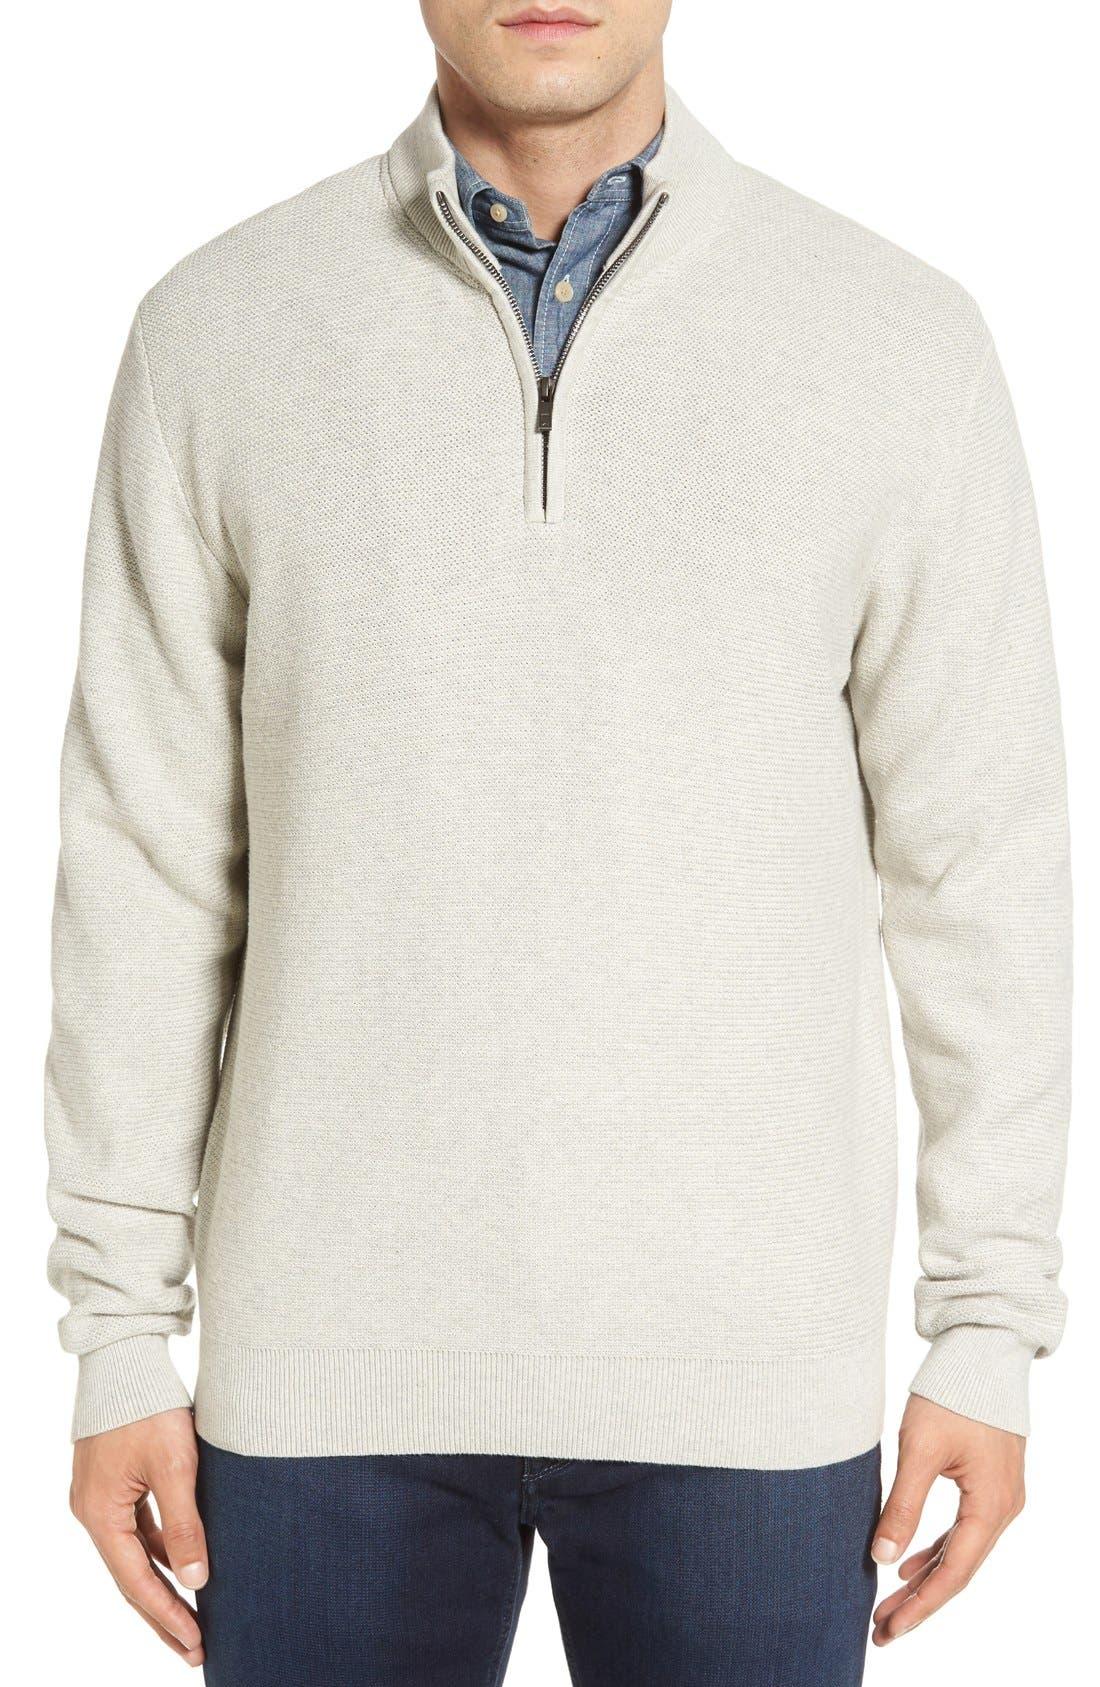 'Benson' Quarter Zip Textured Knit Sweater,                         Main,                         color, Limestone Heather